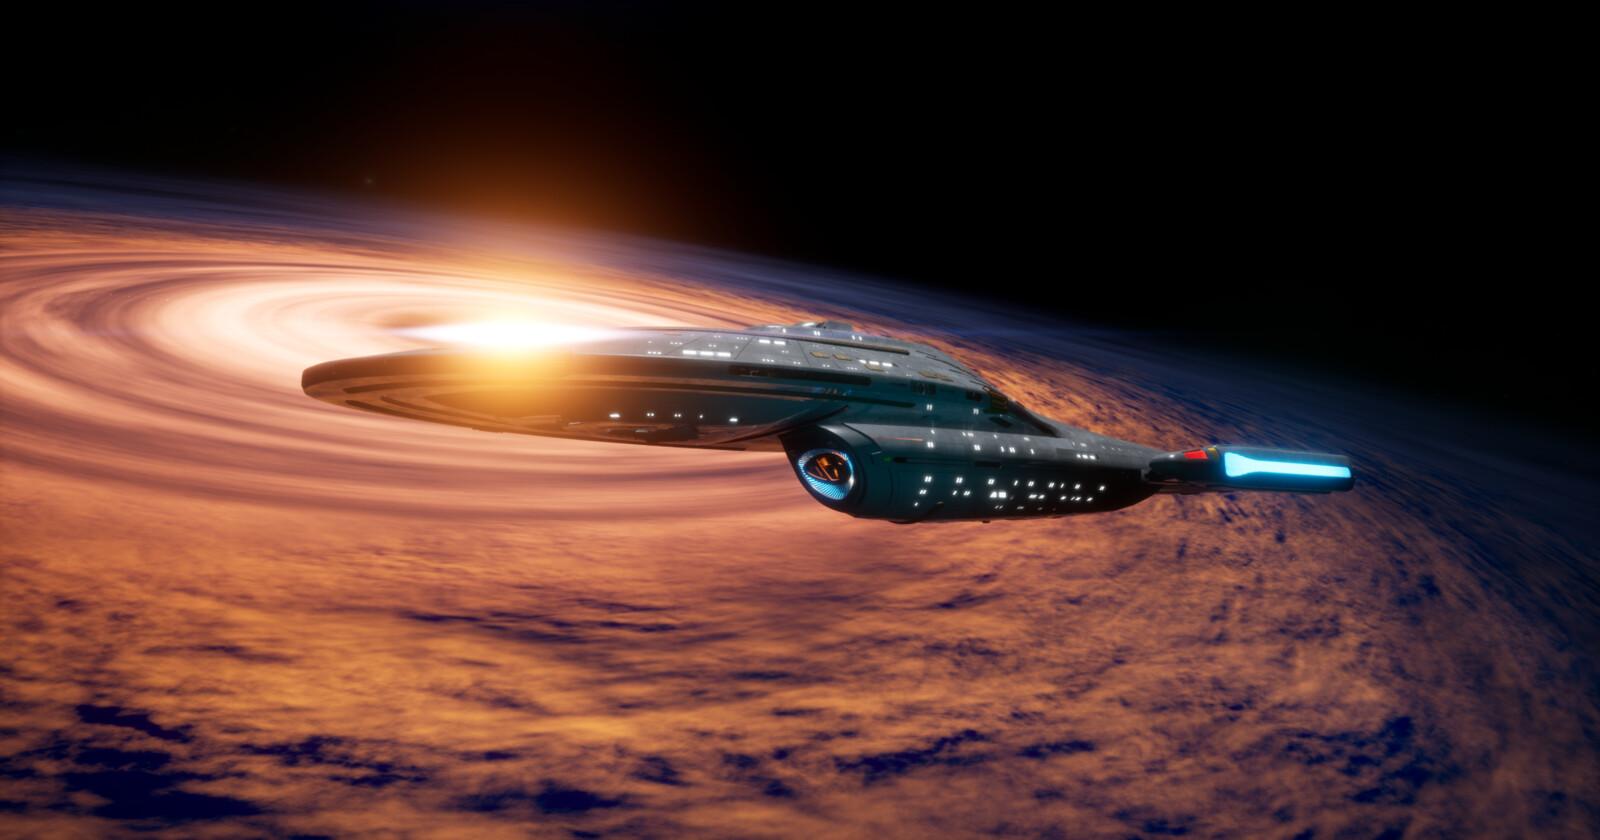 Voyager + Shuttles